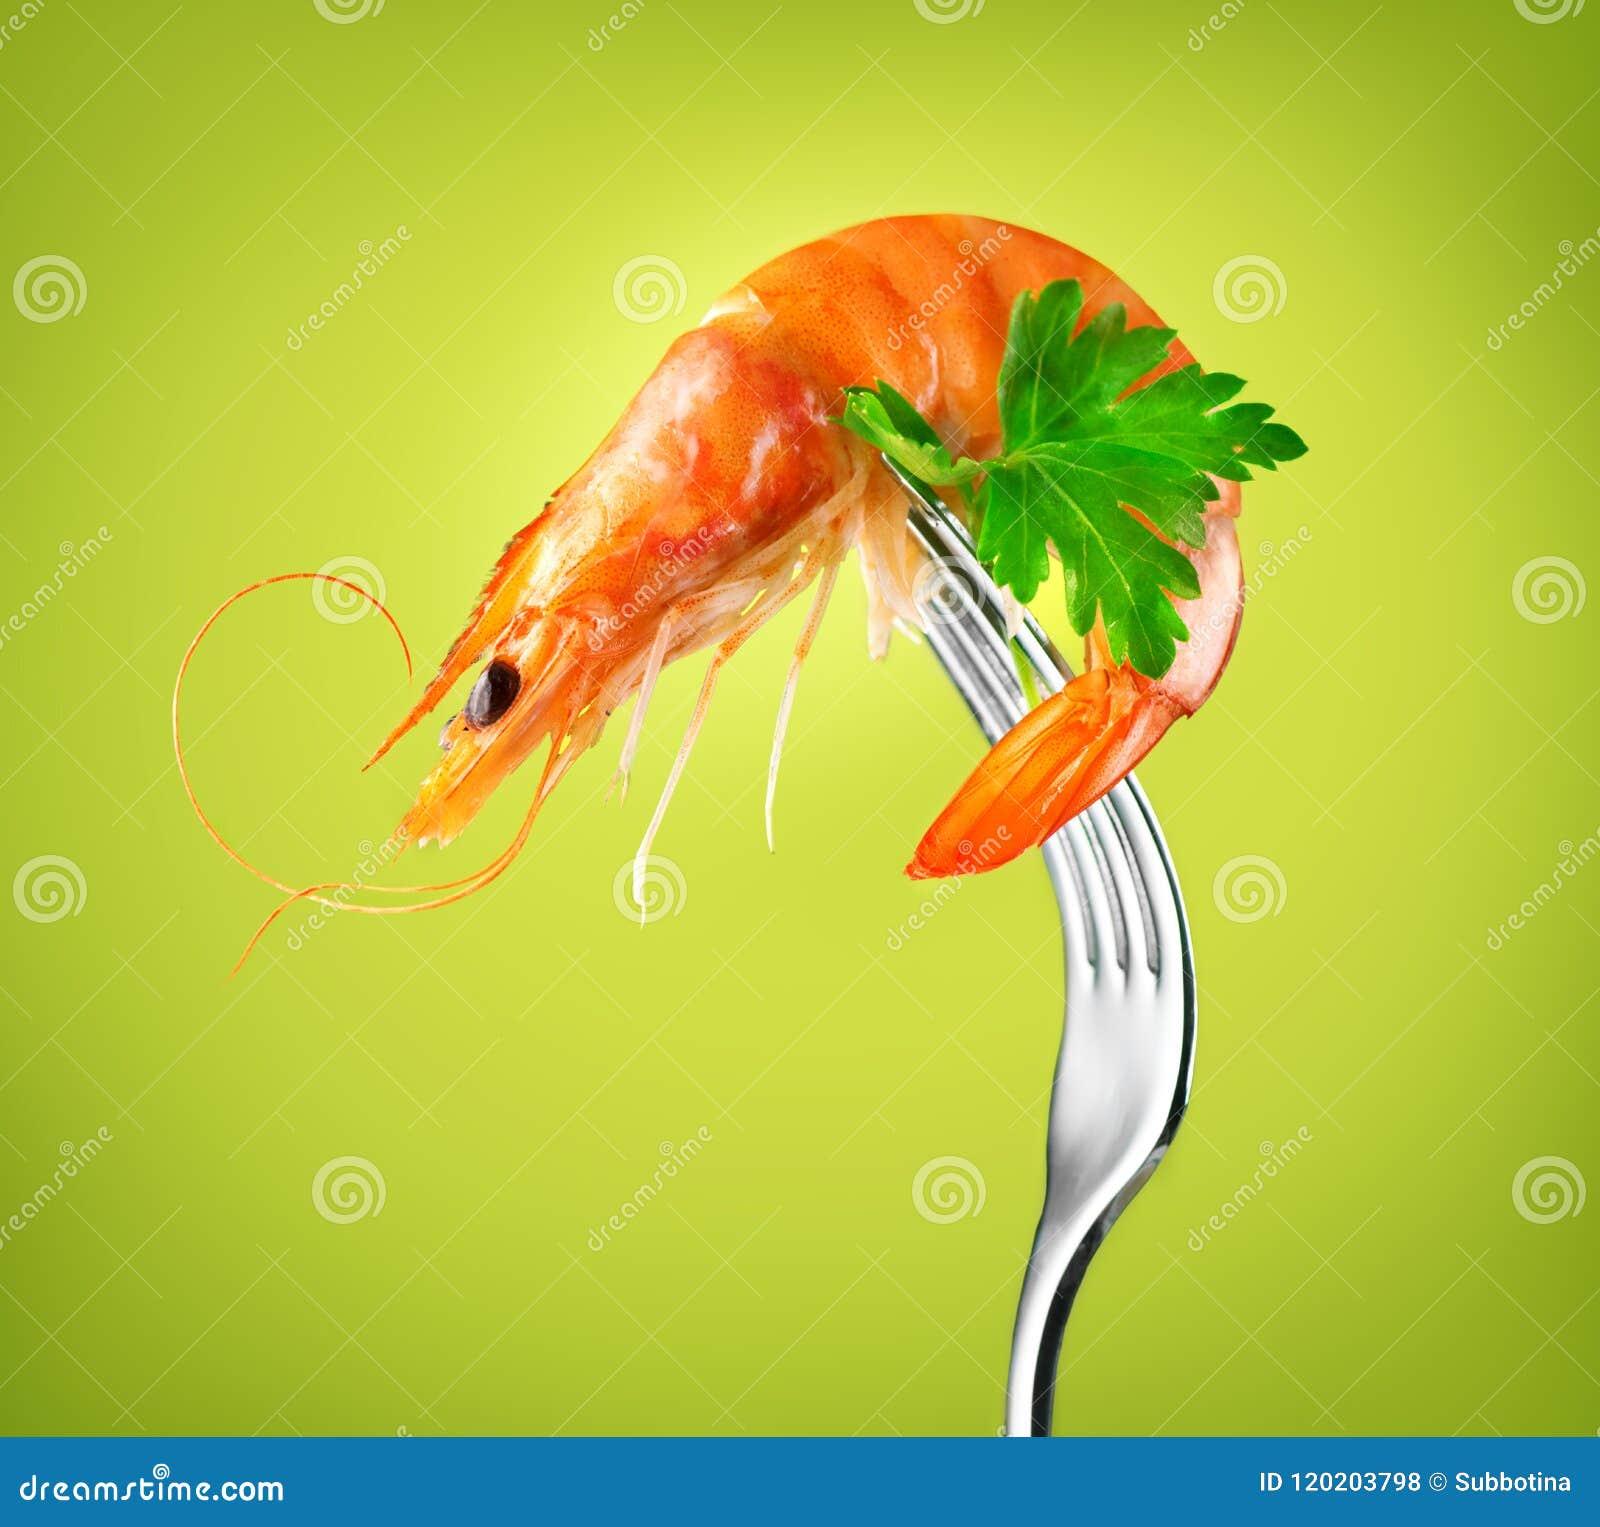 Shrimp. Fresh Prawn on a fork rotated on Green Background. Seafood, preparing healthy gourmet food